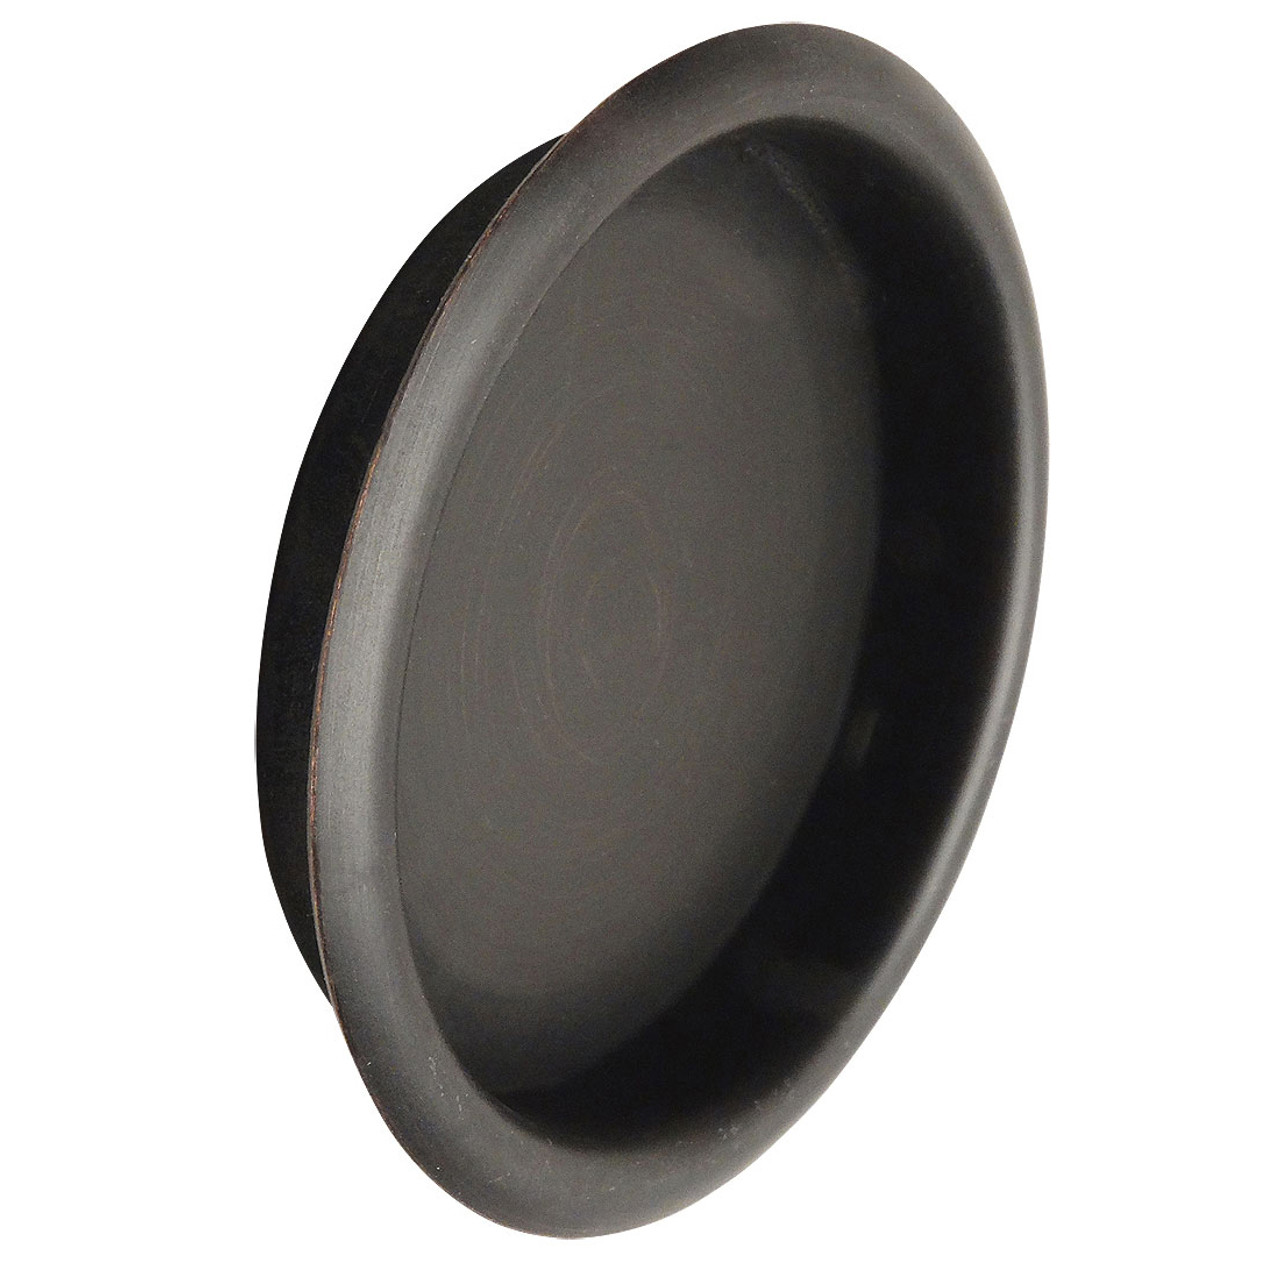 609377 Designers Impressions Oil Rubbed Bronze 6 x 30 Kick Plate